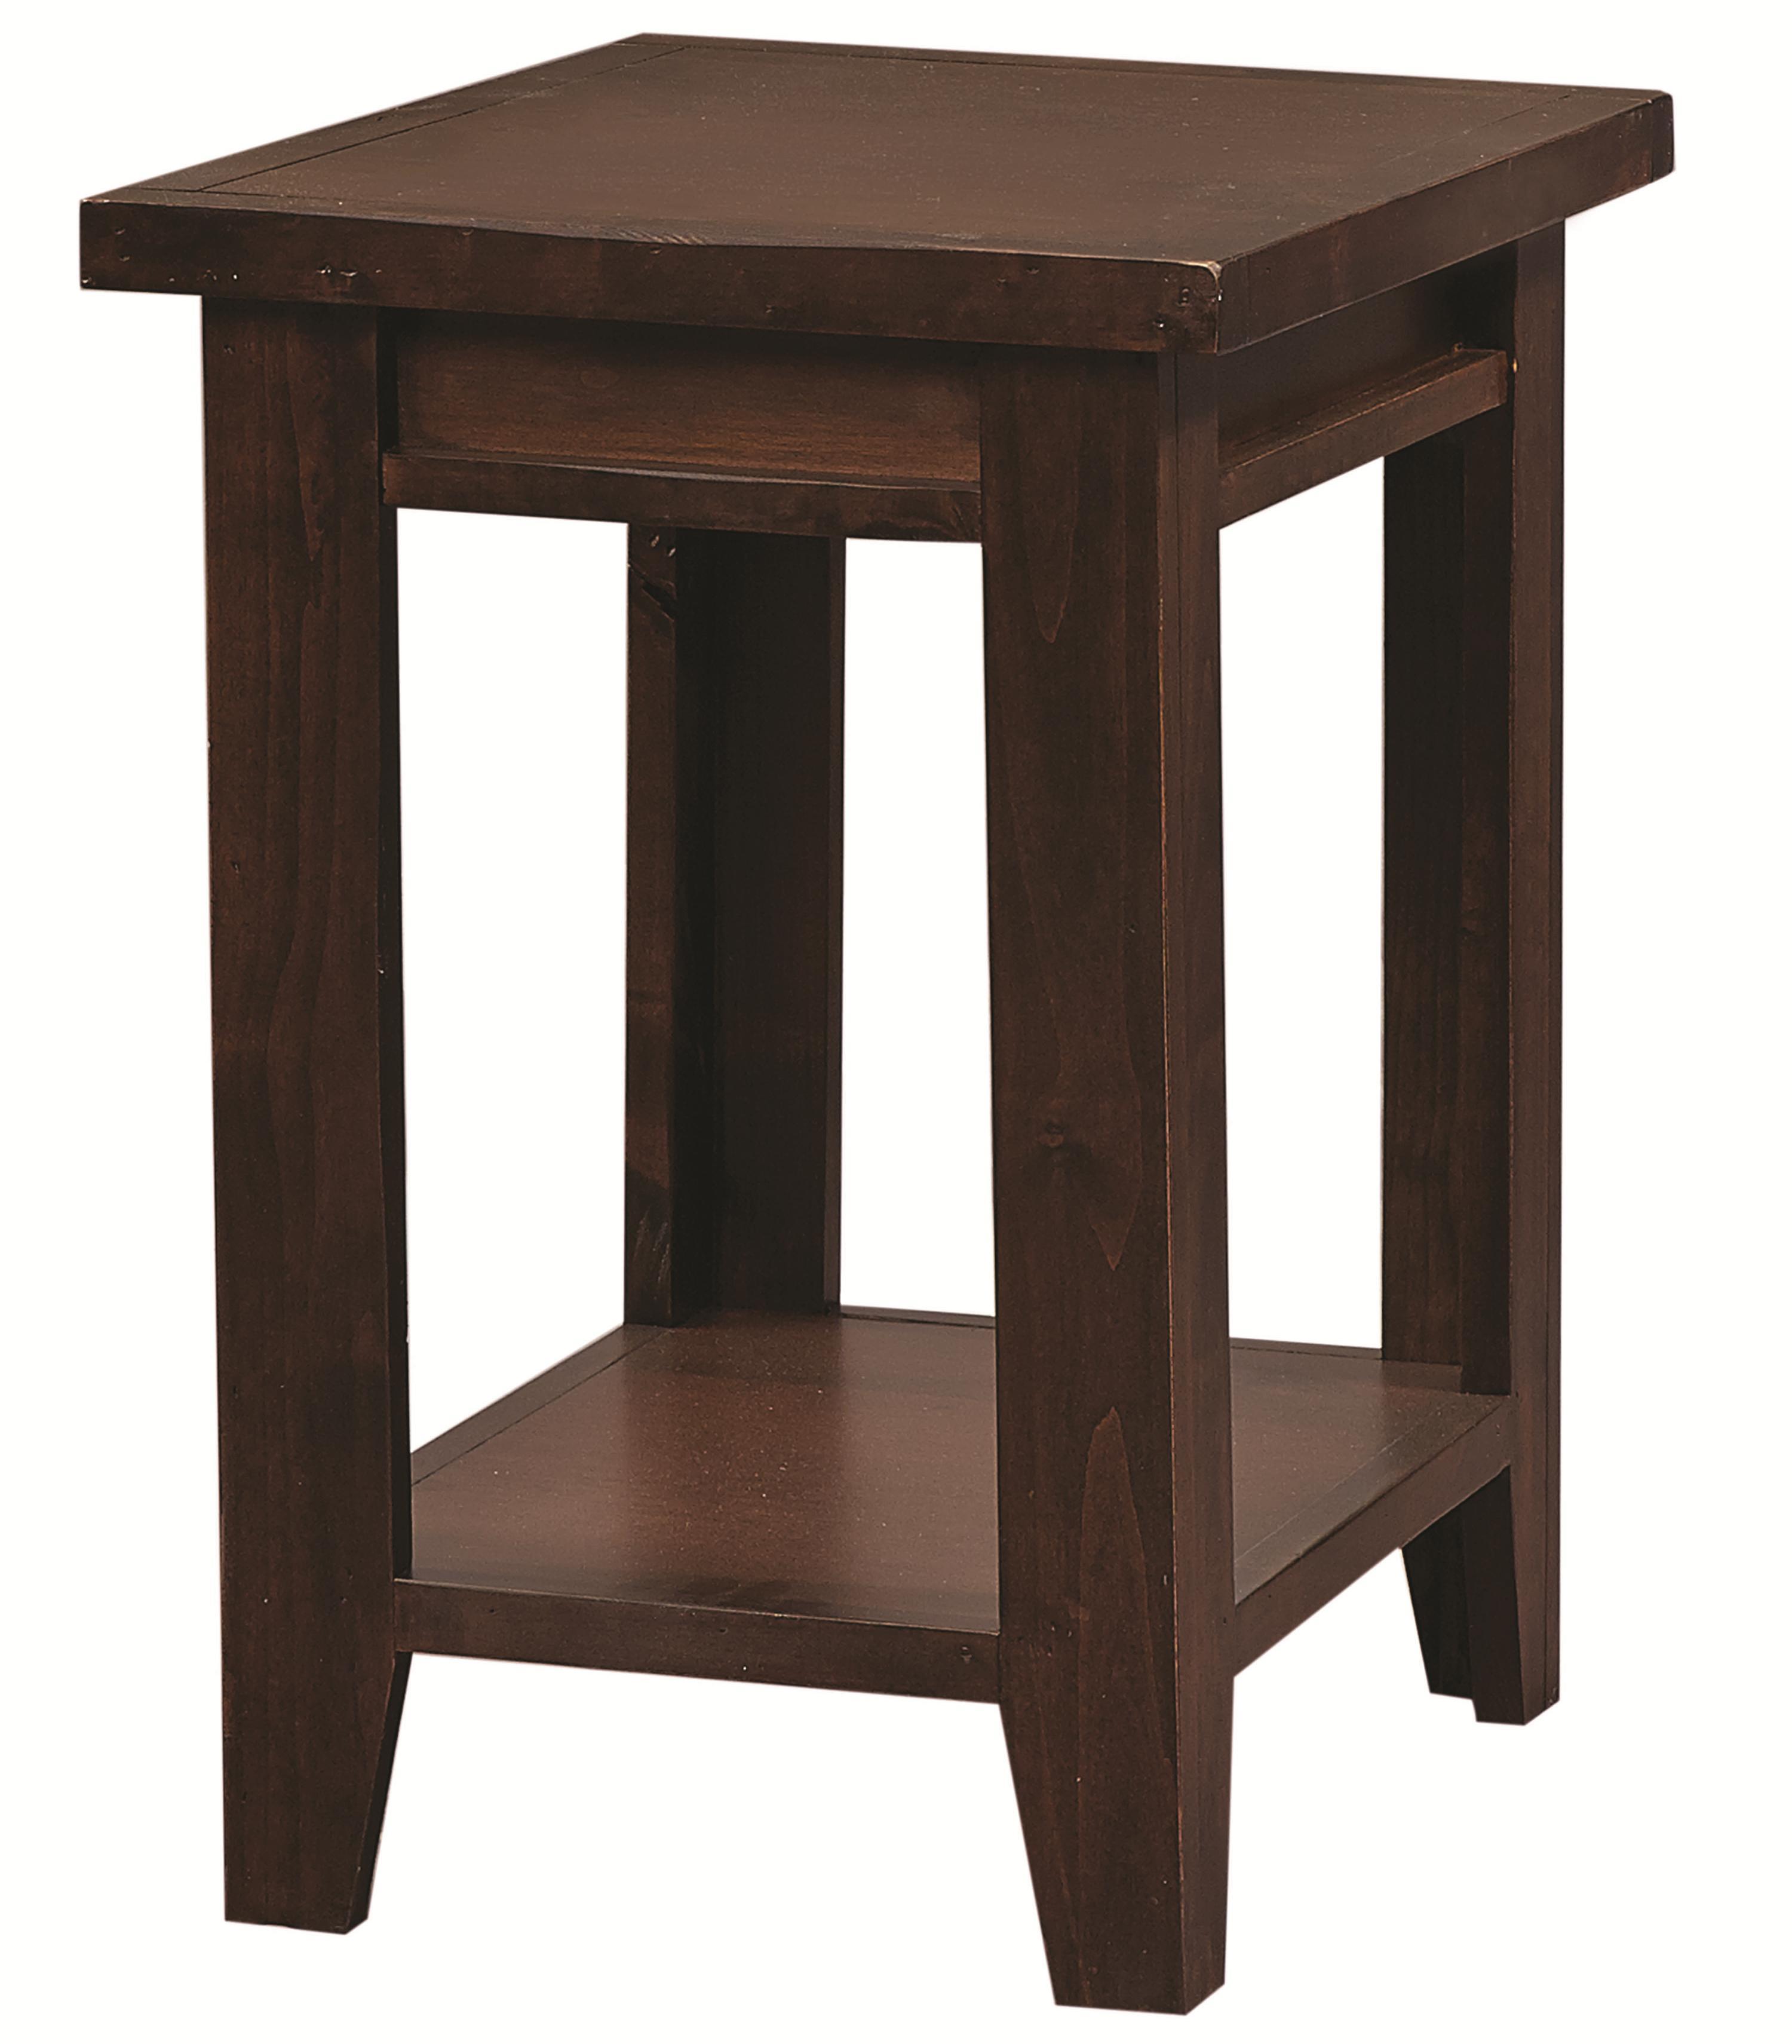 Aspenhome alder grove dg913 tob chairside table with shelf for Hudsons furniture